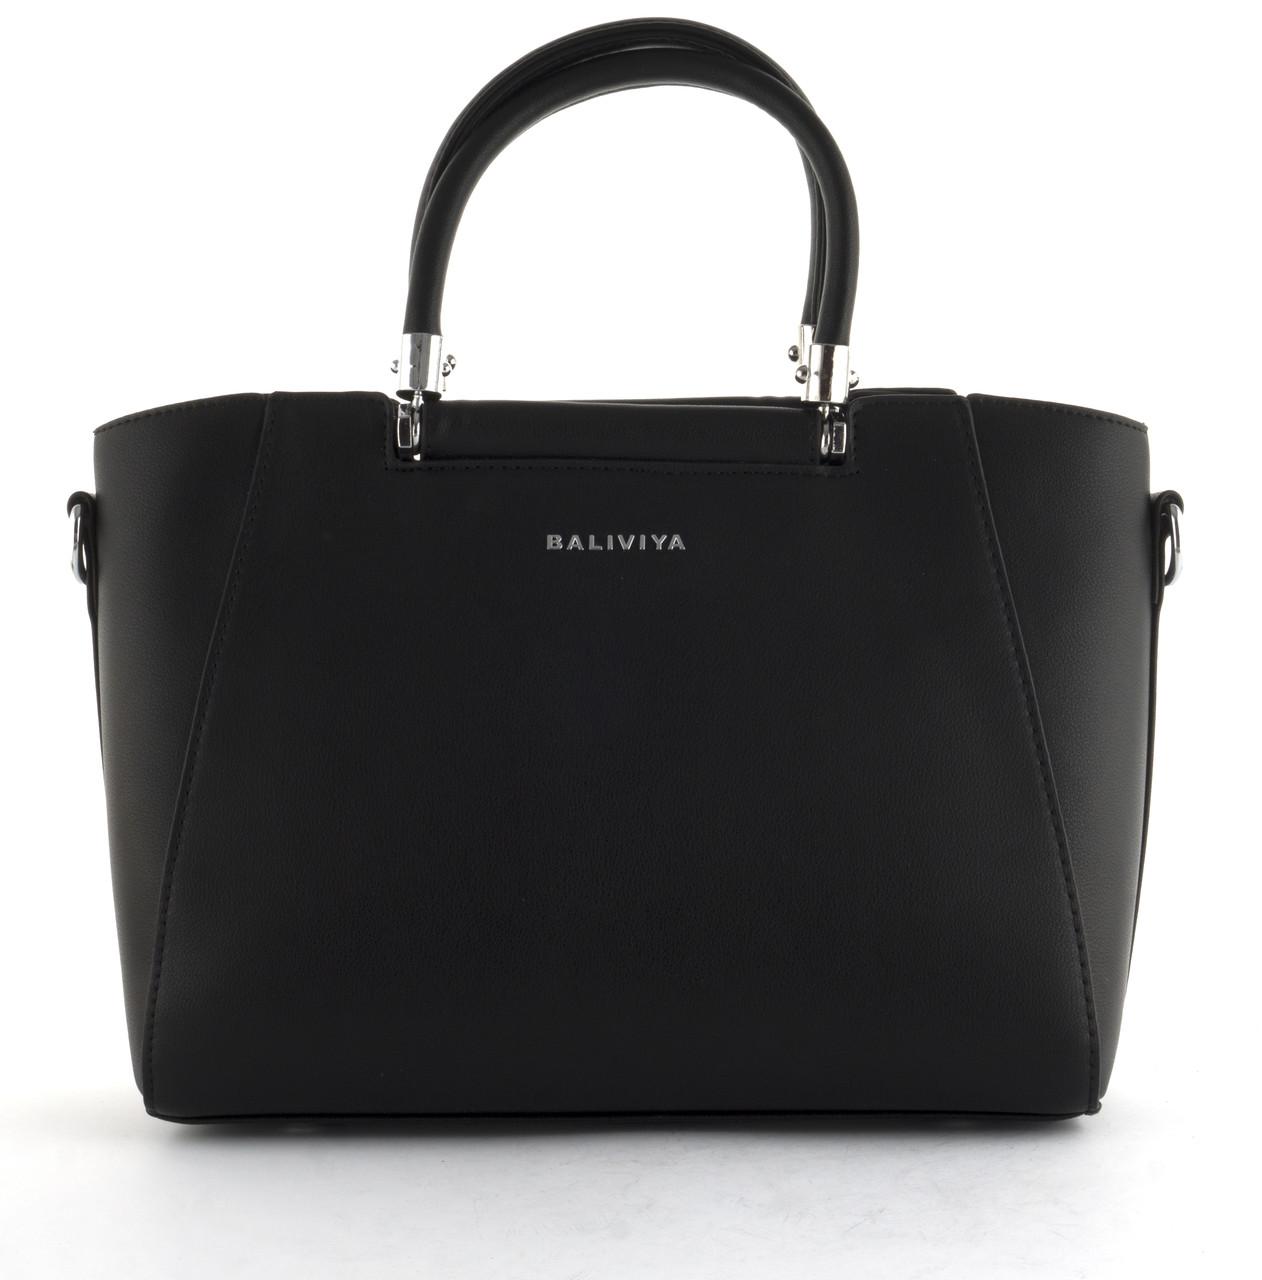 Удобная надежная стильная прочная женская сумка BALIVIYA art. 7672